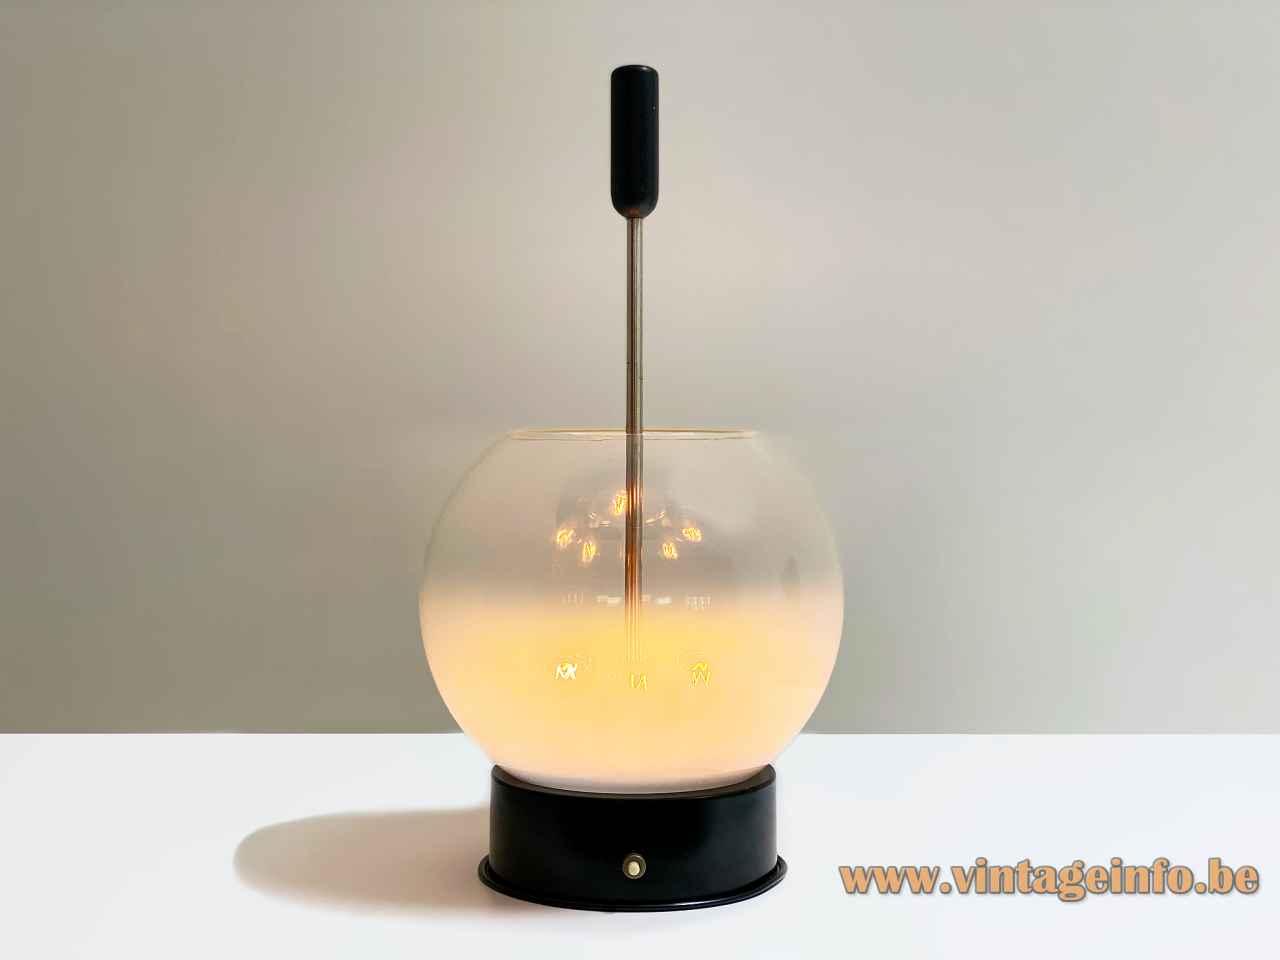 Gino Sarfatti Arteluce 593 table lamp round black metal base misty globe glass lampshade 1960s Italy